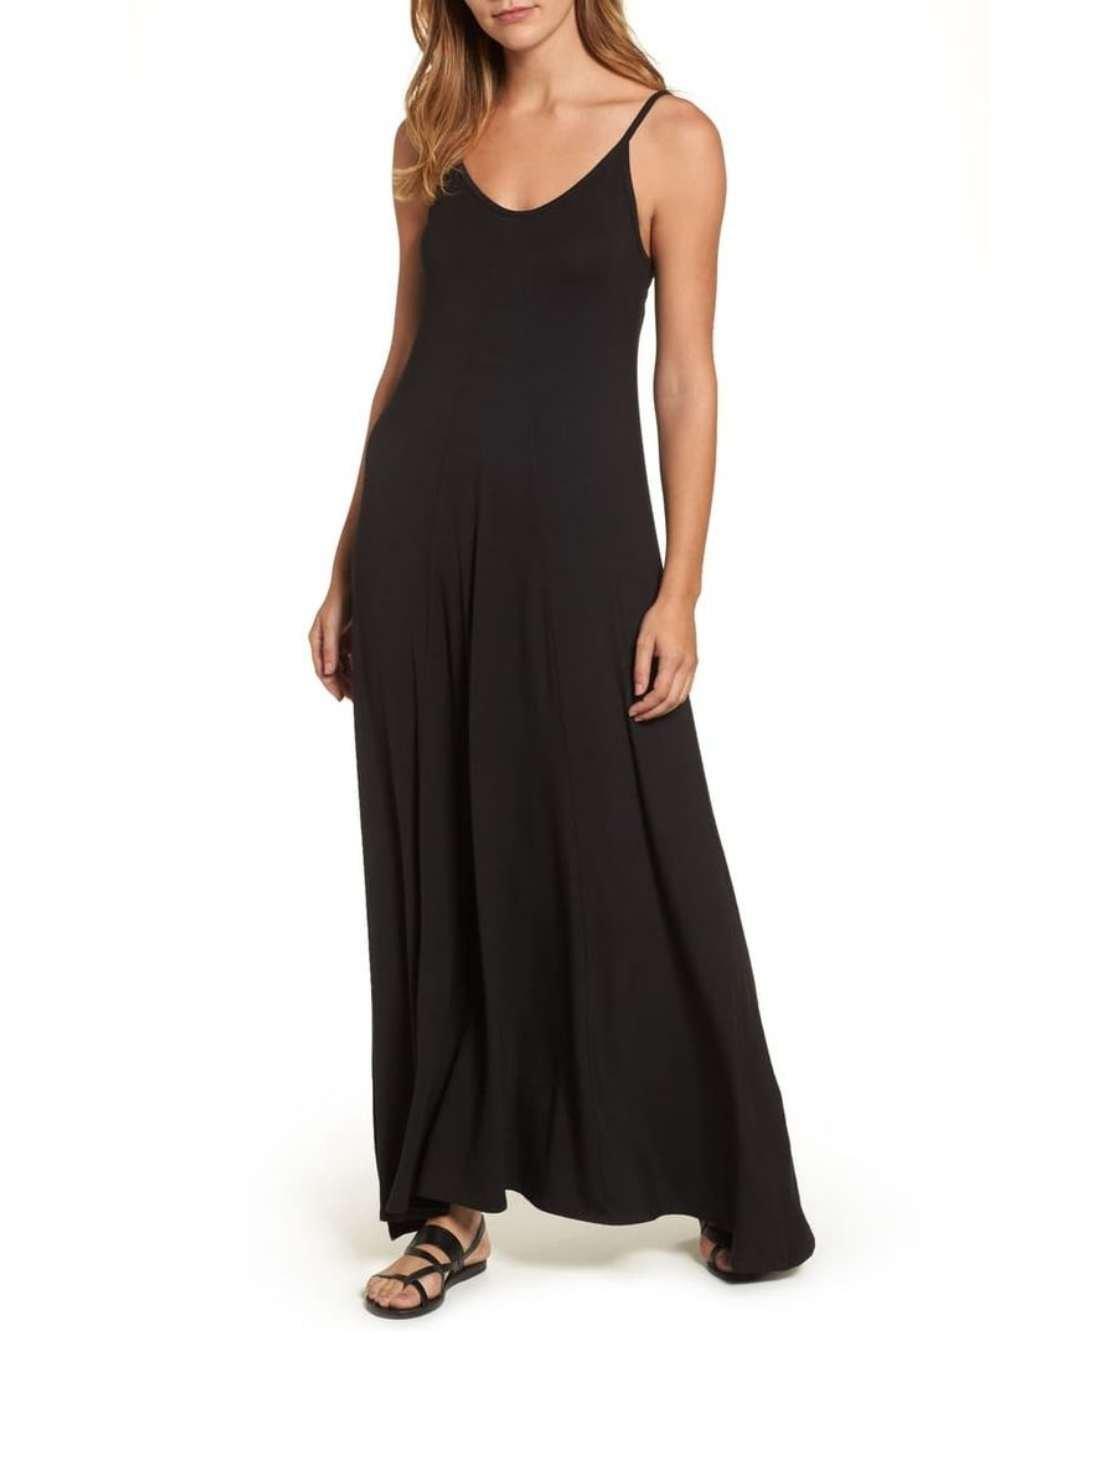 Petite Black Casual Maxi Dresses